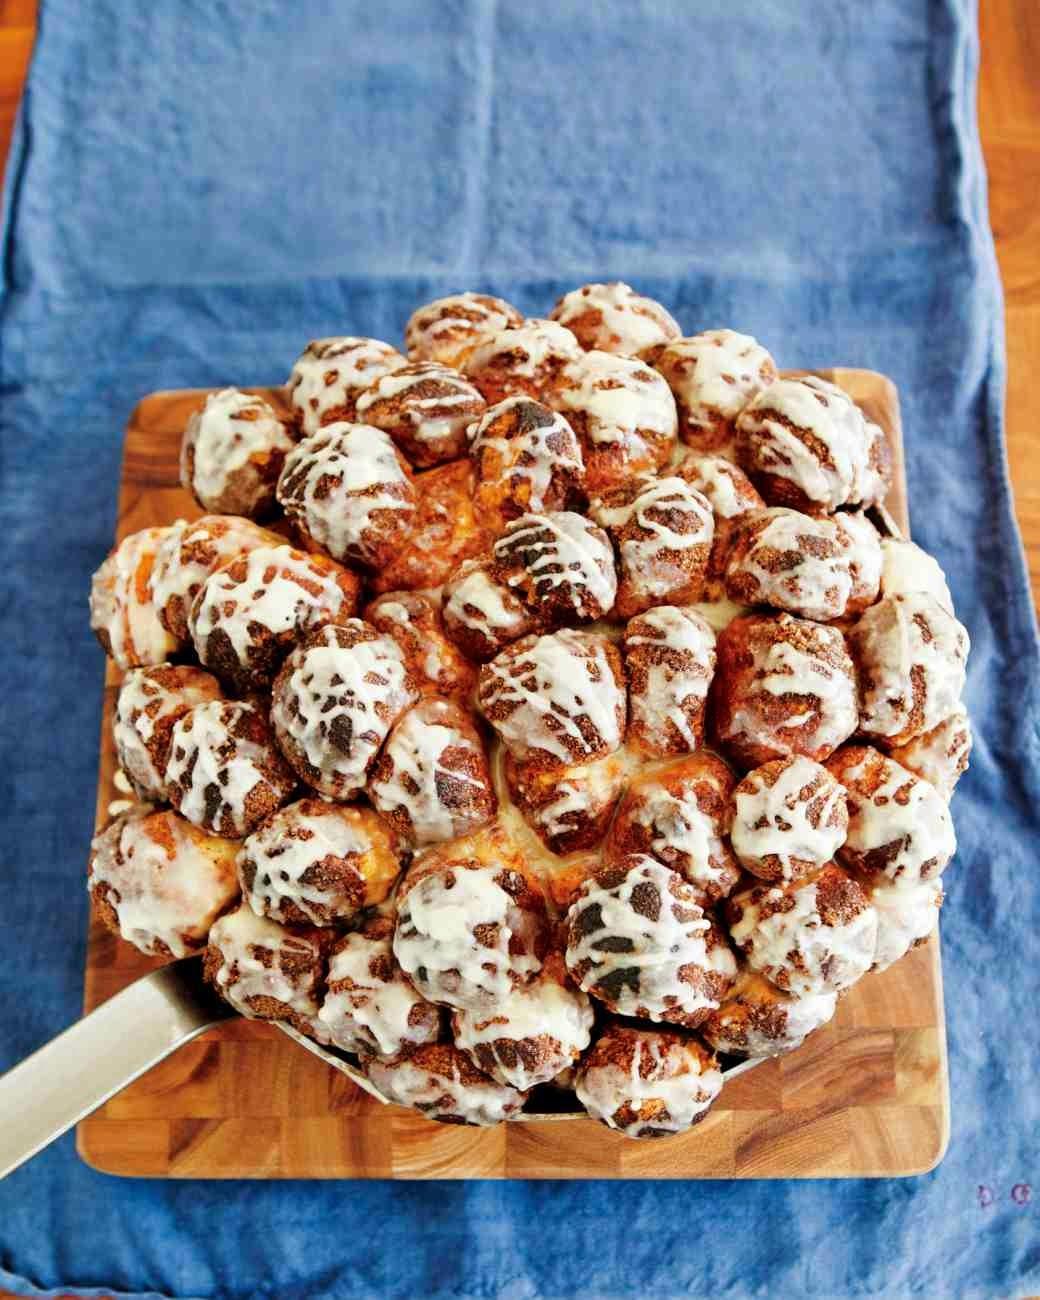 Brunch Recipes to Make on Easter Sunday